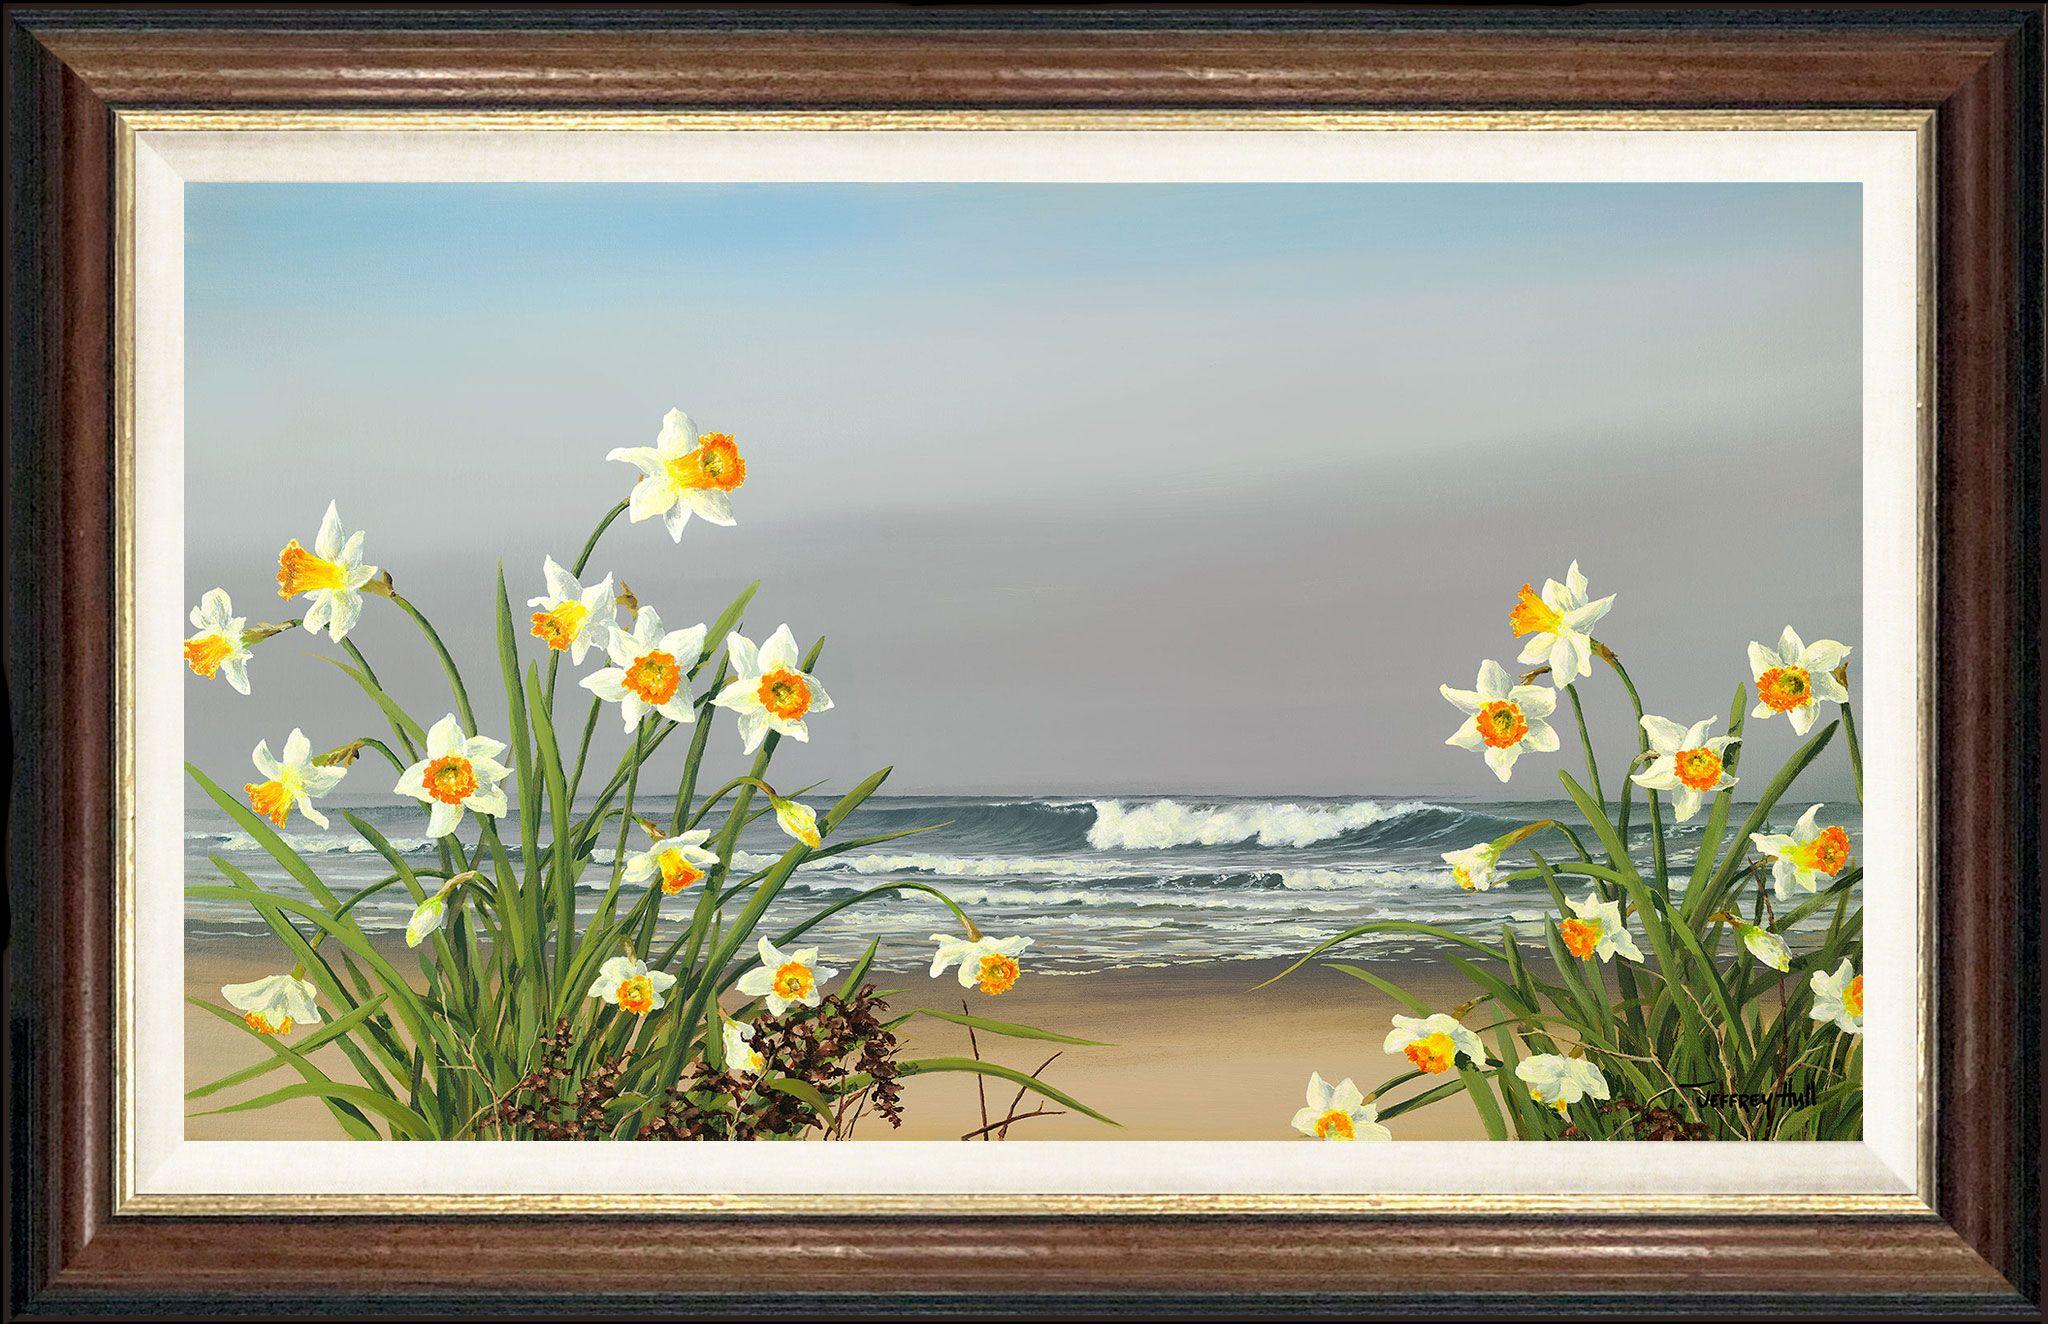 Shoreline-Daffodils-OpenEd-Malabar-White-Liner-4-Website-2021